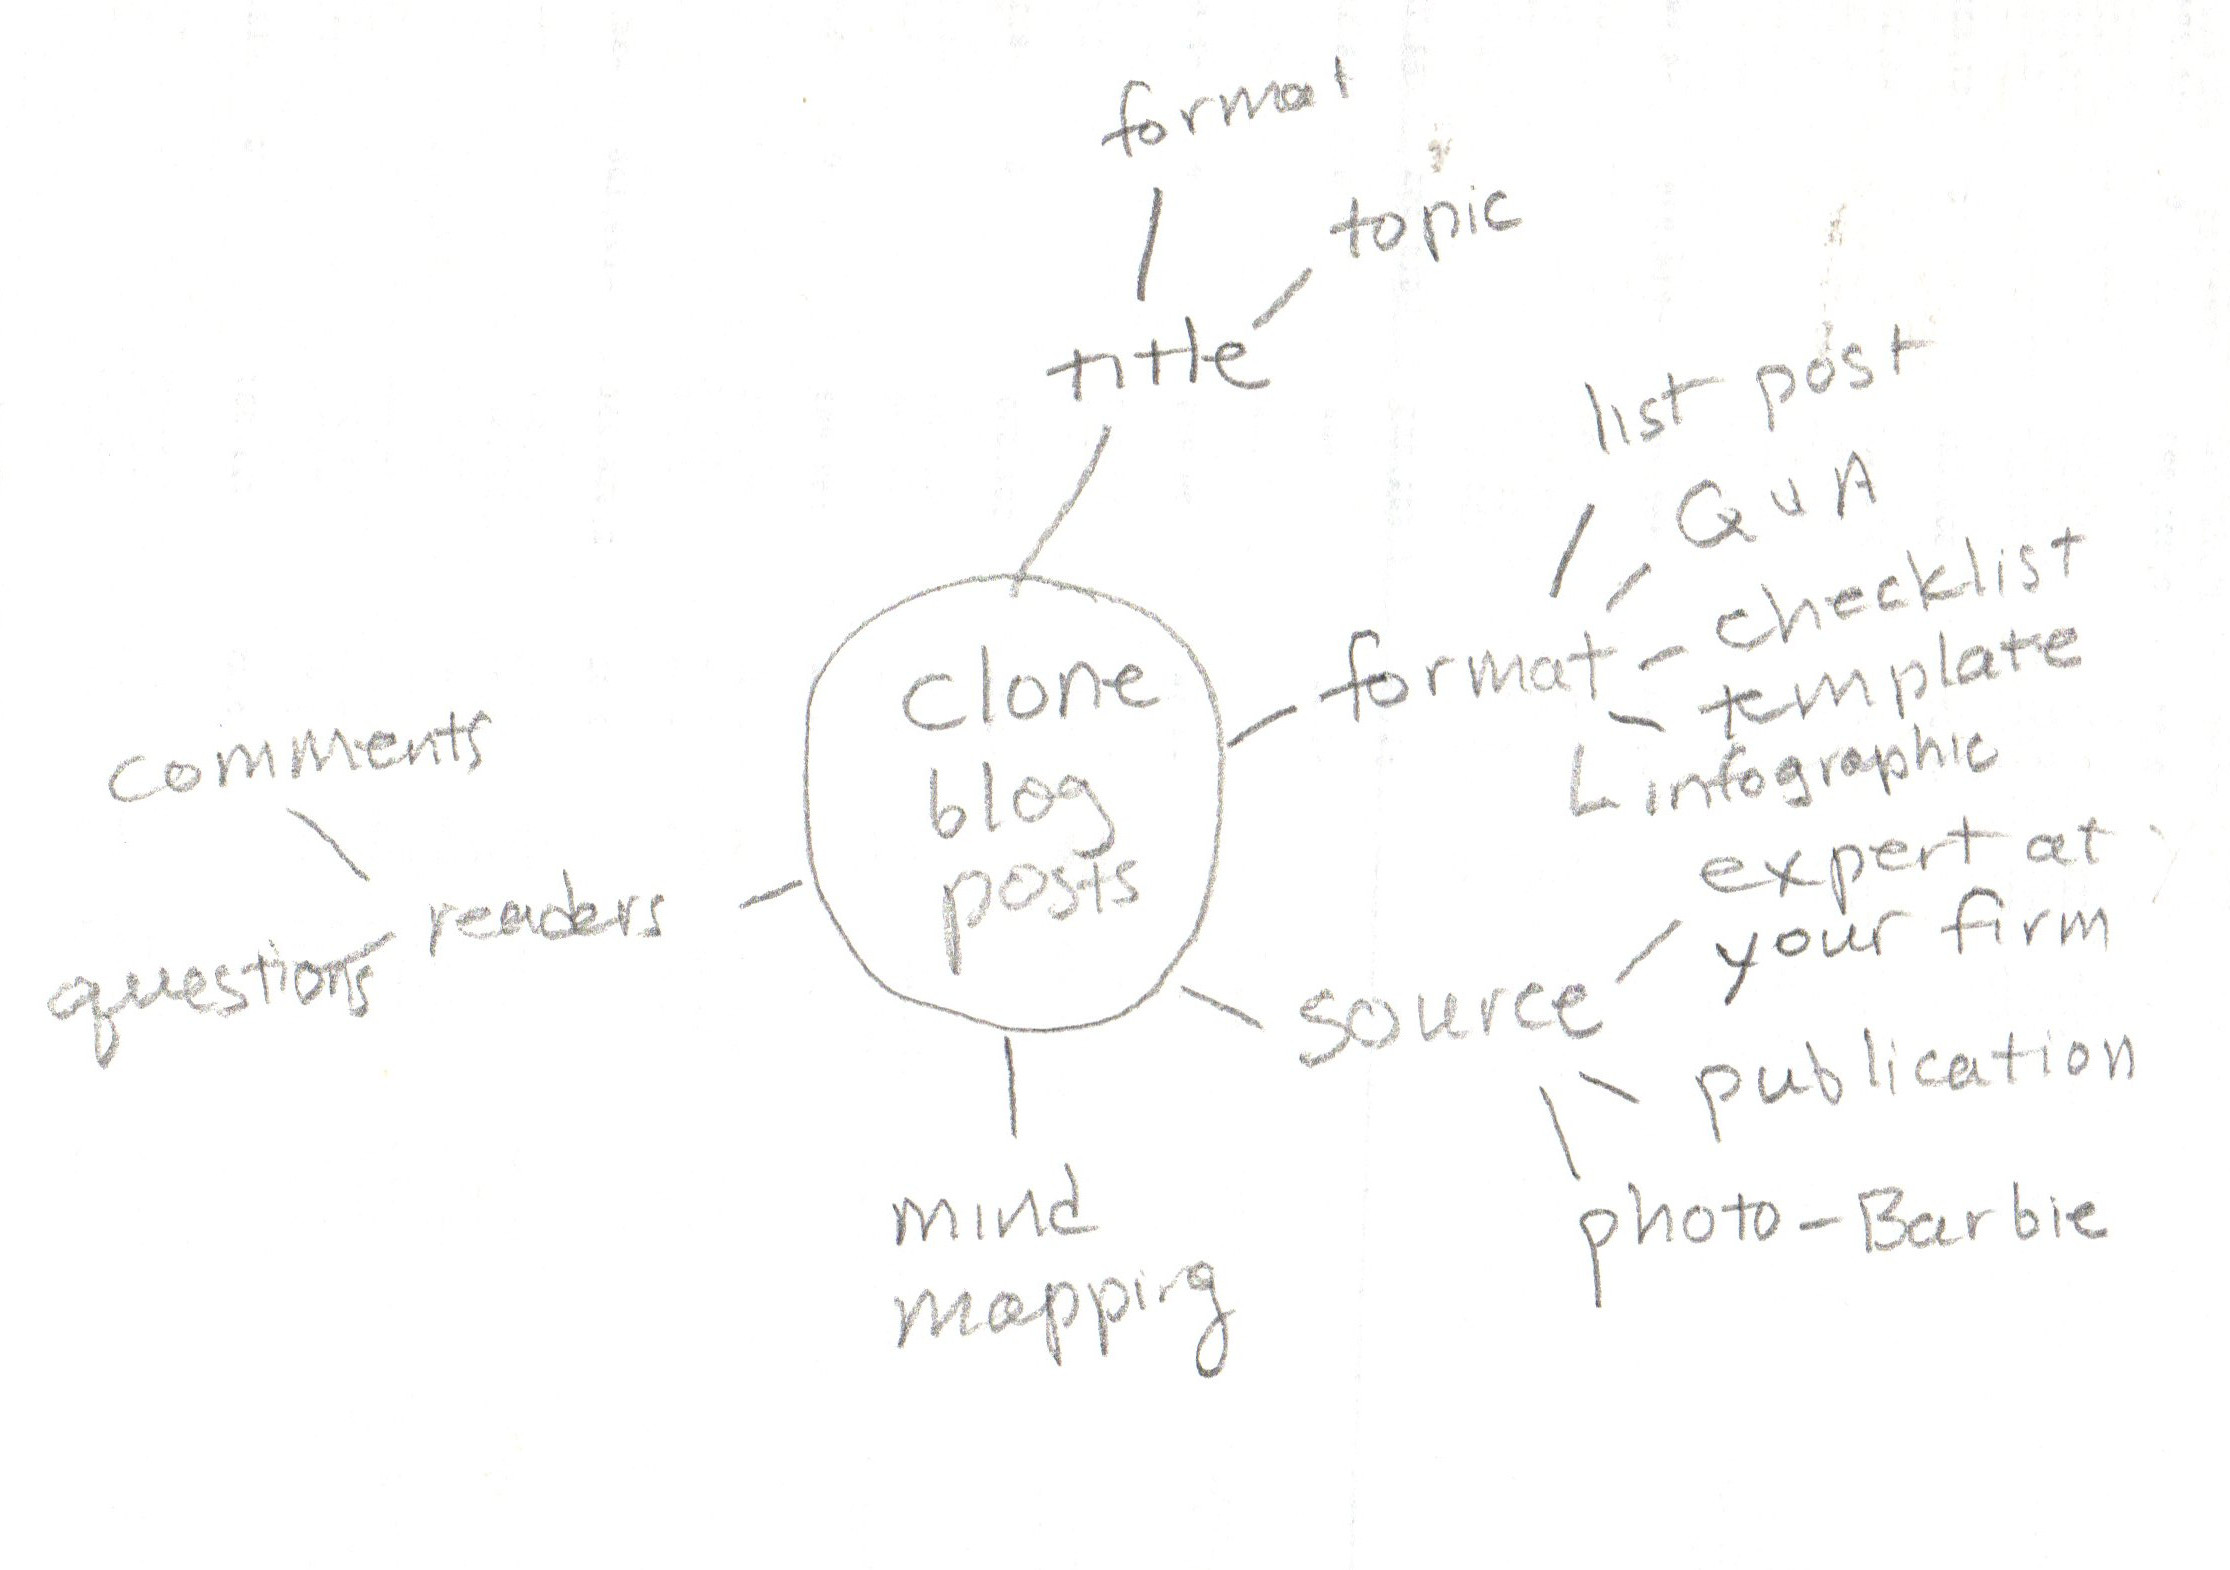 clone blog post mind map